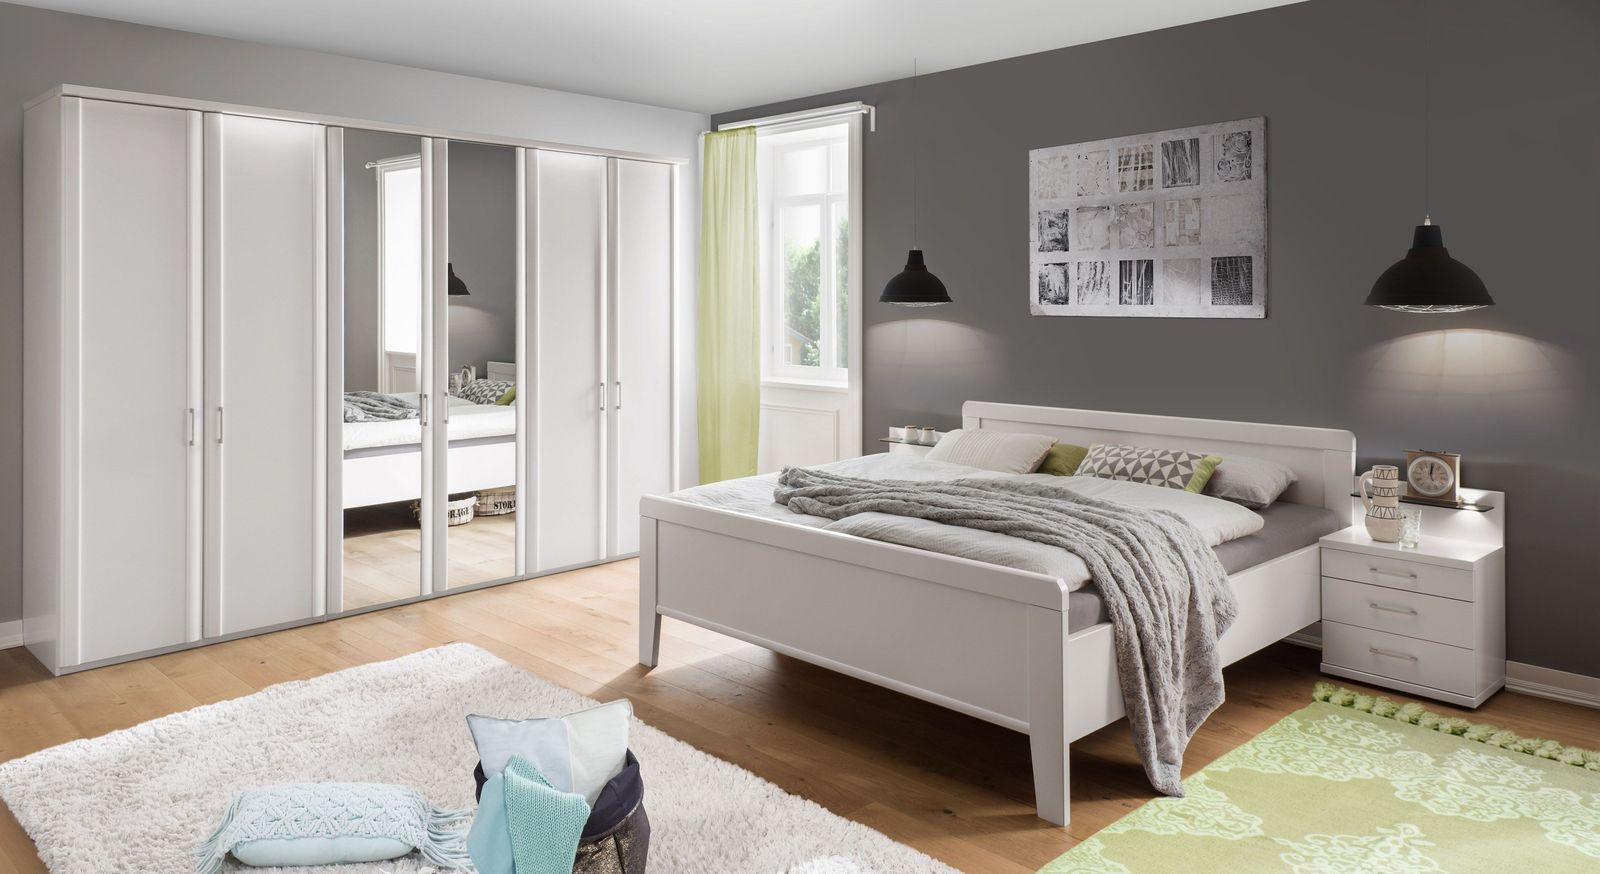 Komplett Schlafzimmer Calimera mit Komfort-Doppelbett